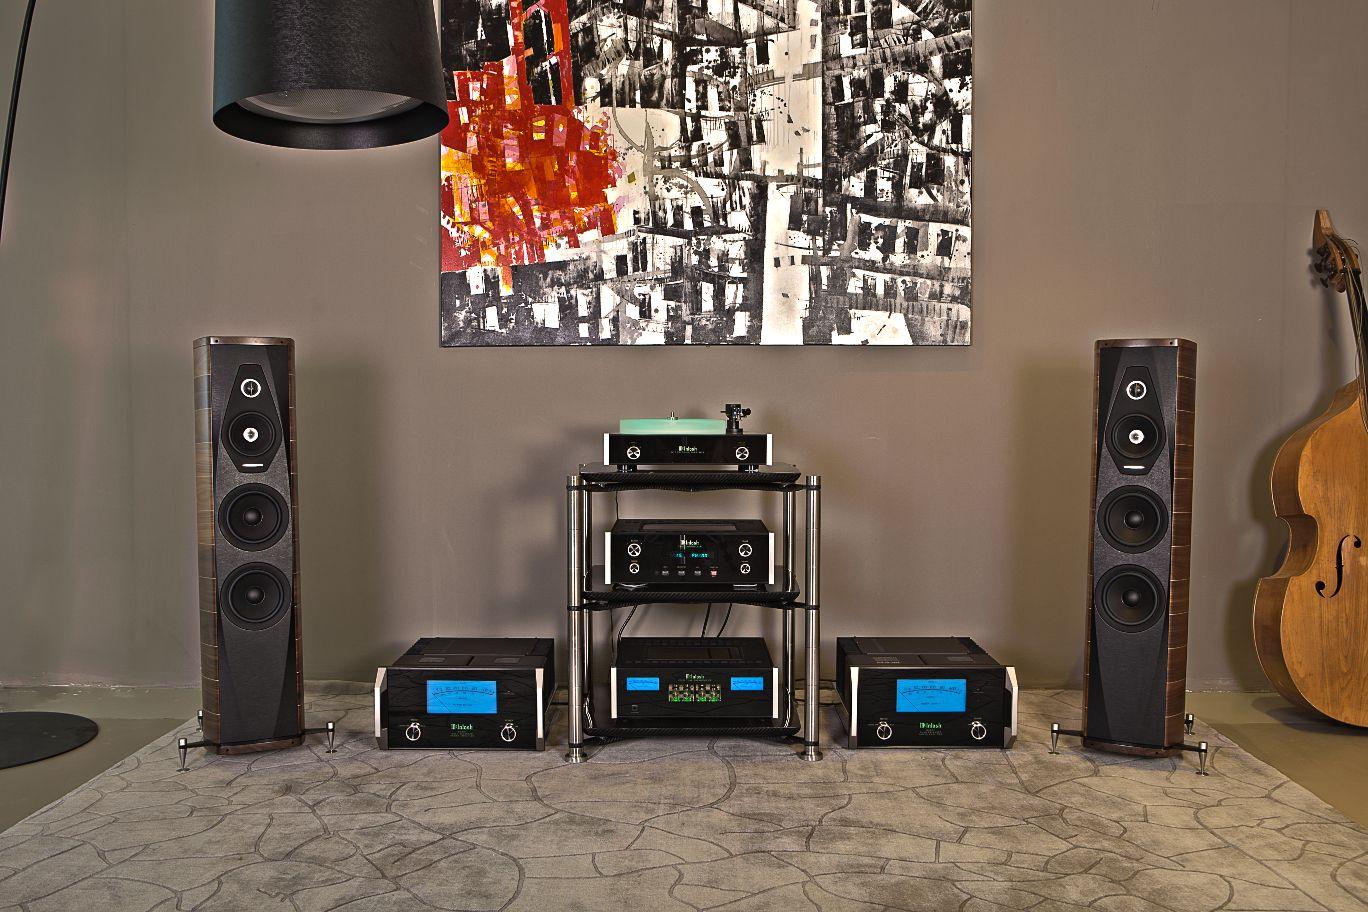 Revolution Line AEON with McIntosh and Sonus Faber #bassocontinuo #revolutionline #aeon #mcintosh #sonusfaber #audiorack #carbonfiber #madeinitaly #handmade #audiophile #luxury #design